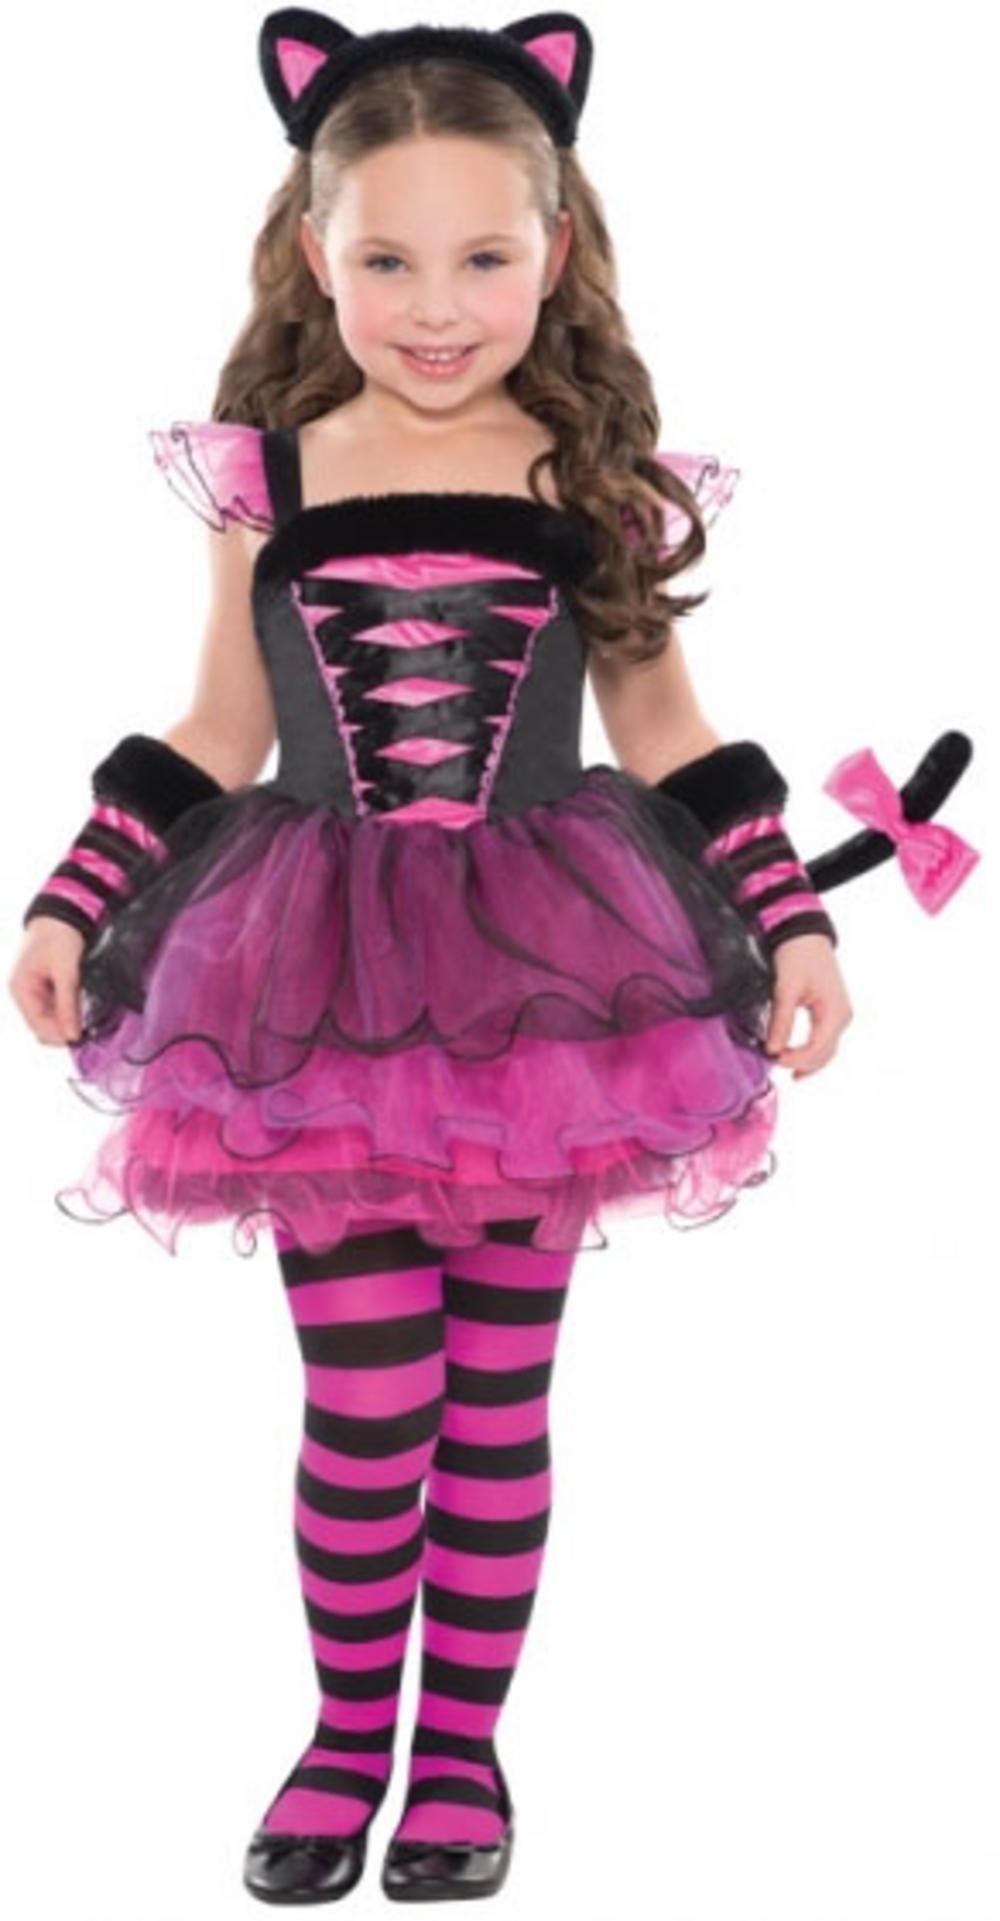 Purrfect Ballerina Costume | All Halloween | Mega Fancy Dress